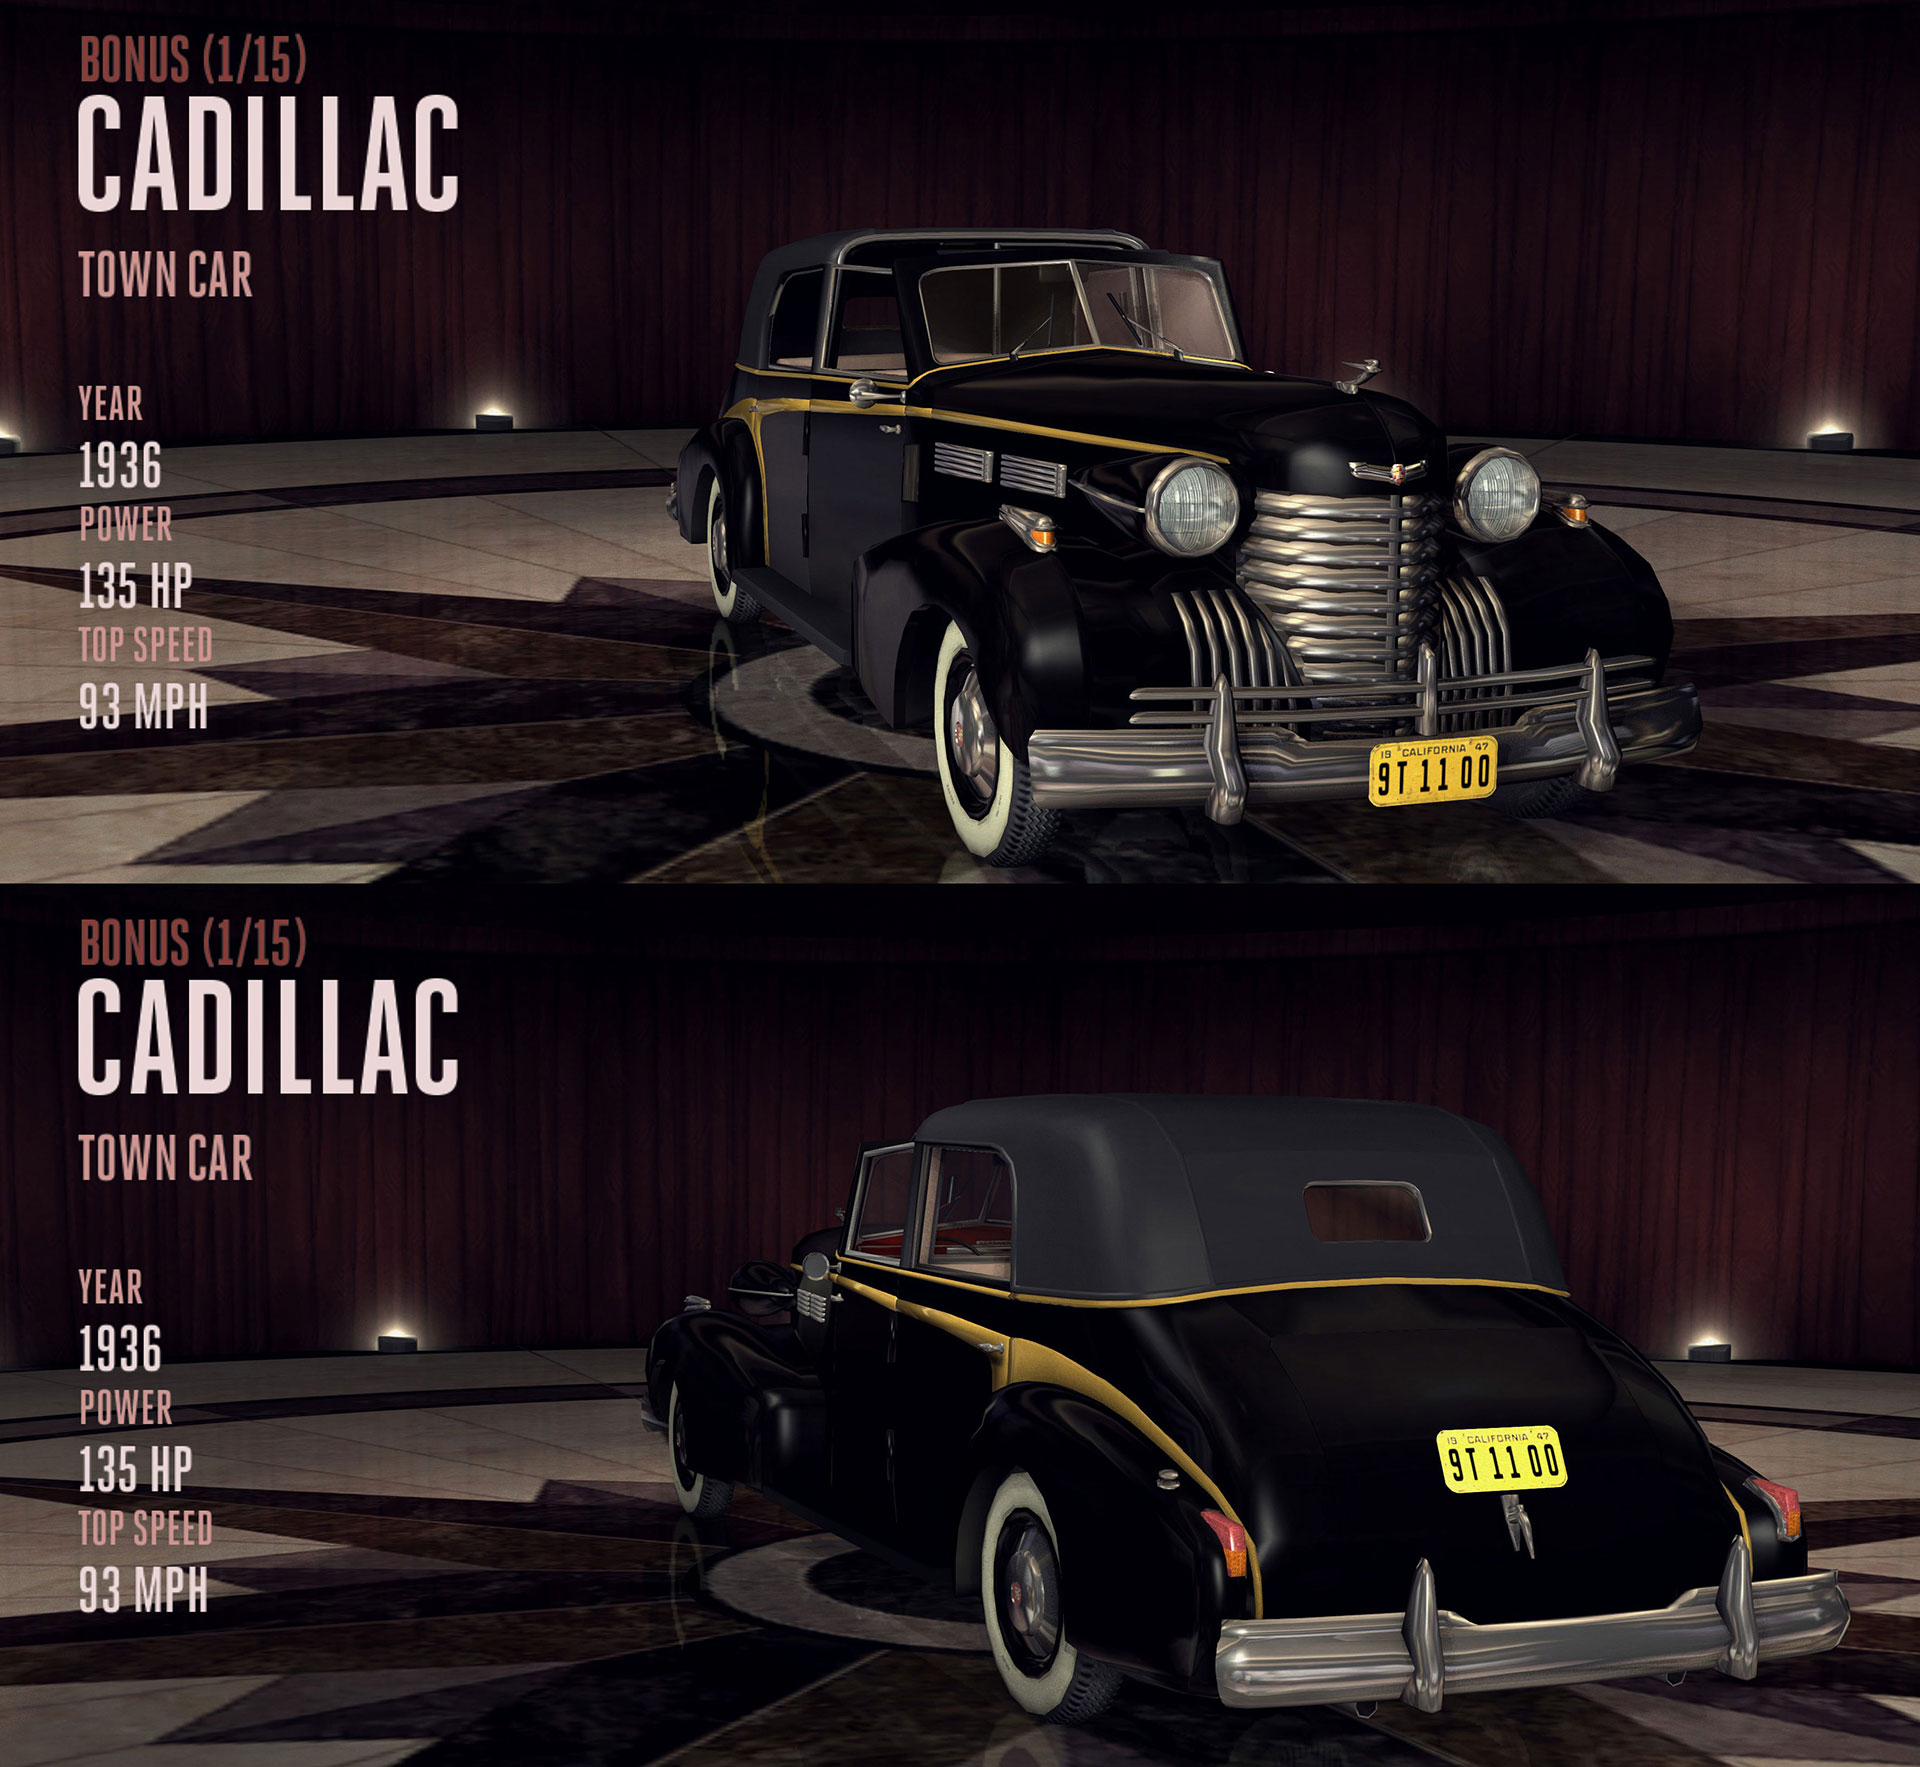 Archivo:1936-cadillac-town-car.jpg